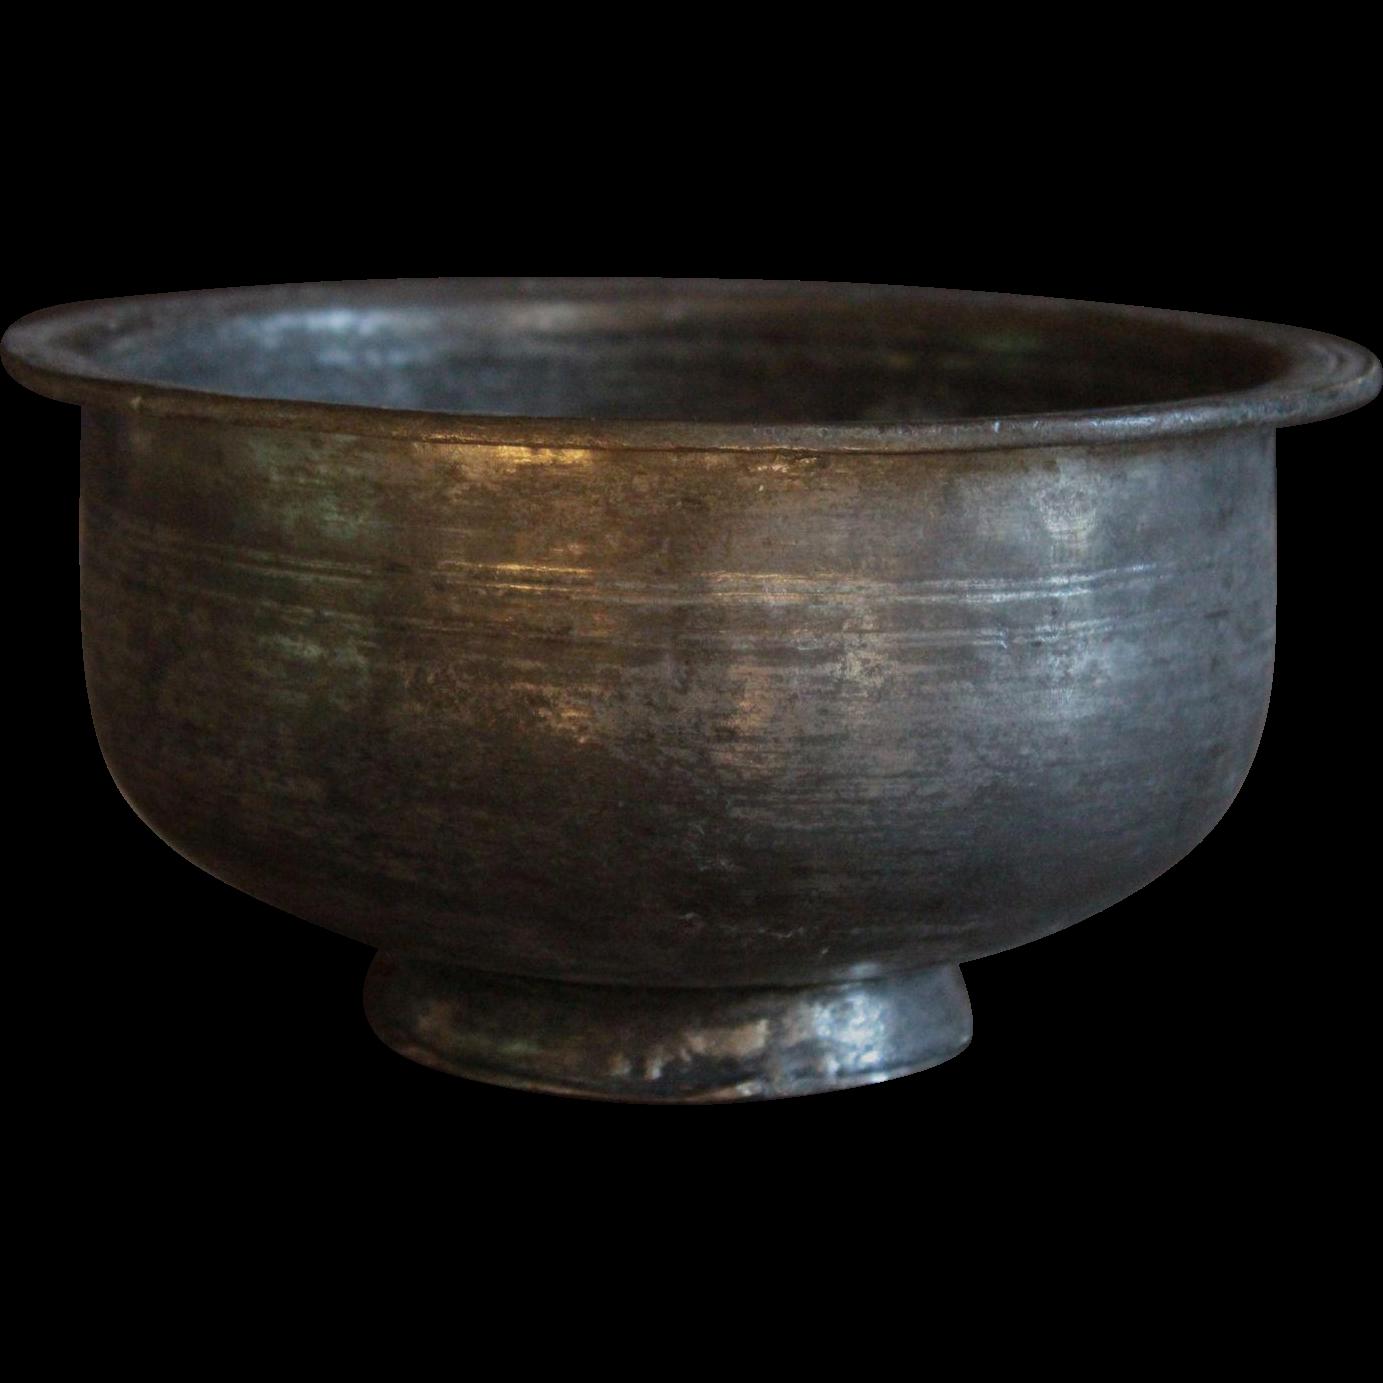 Antique Ottoman Tinned Copper Bowl